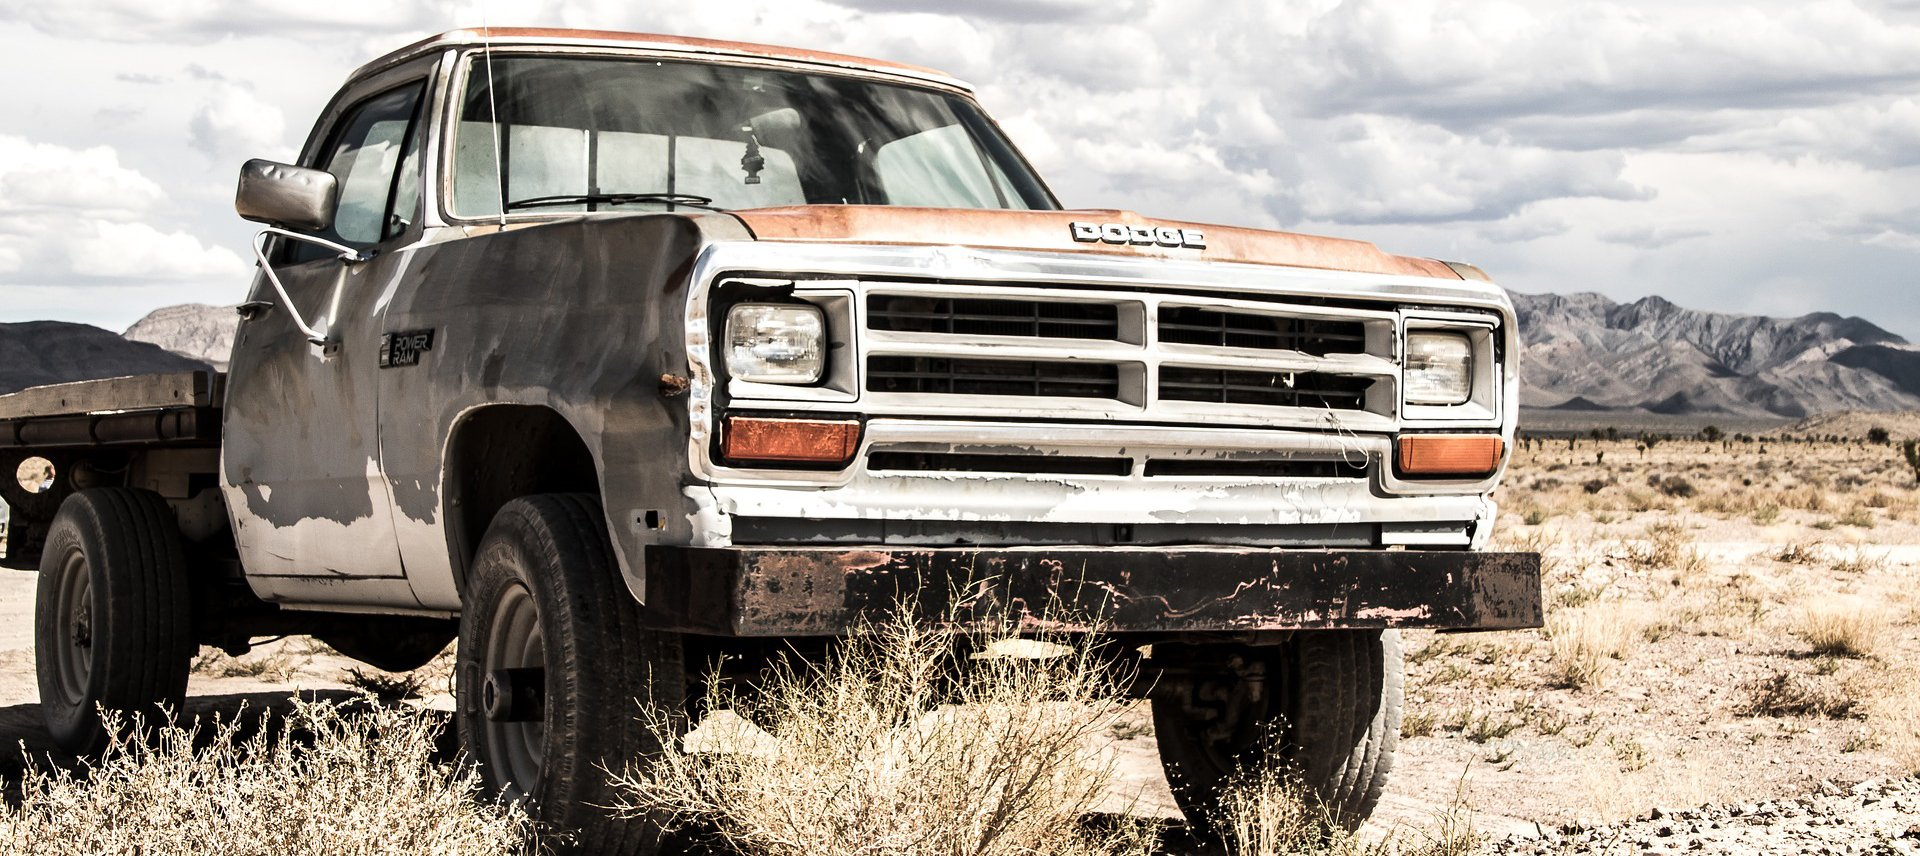 Old Pickup Truck in Arvada Colorado - VeteranCarDonation.org